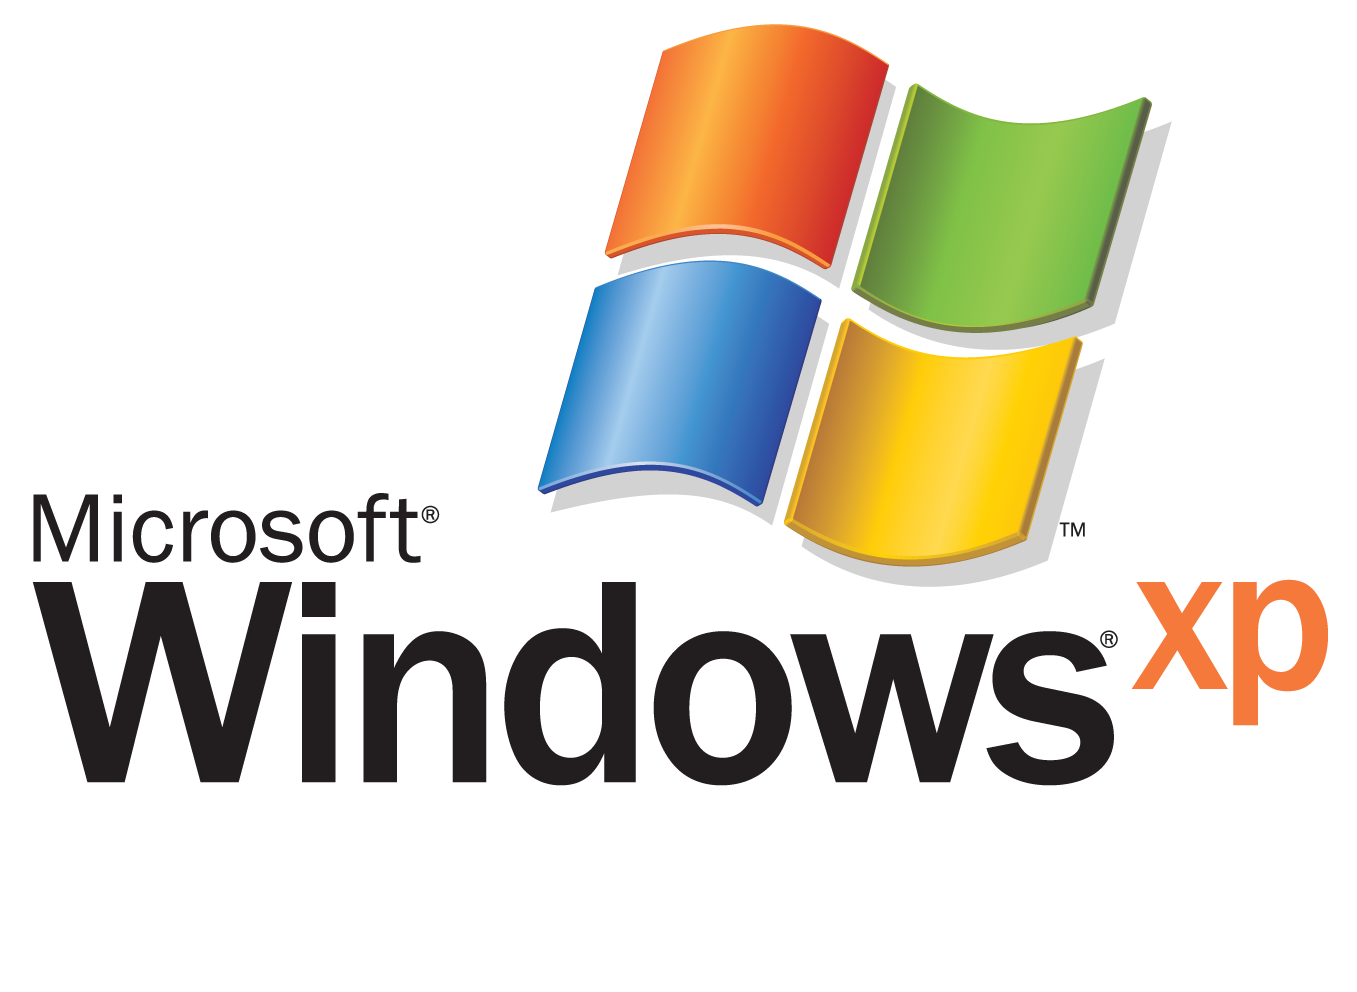 Windows xp professional sp3 (32bit) original iso download youtube.